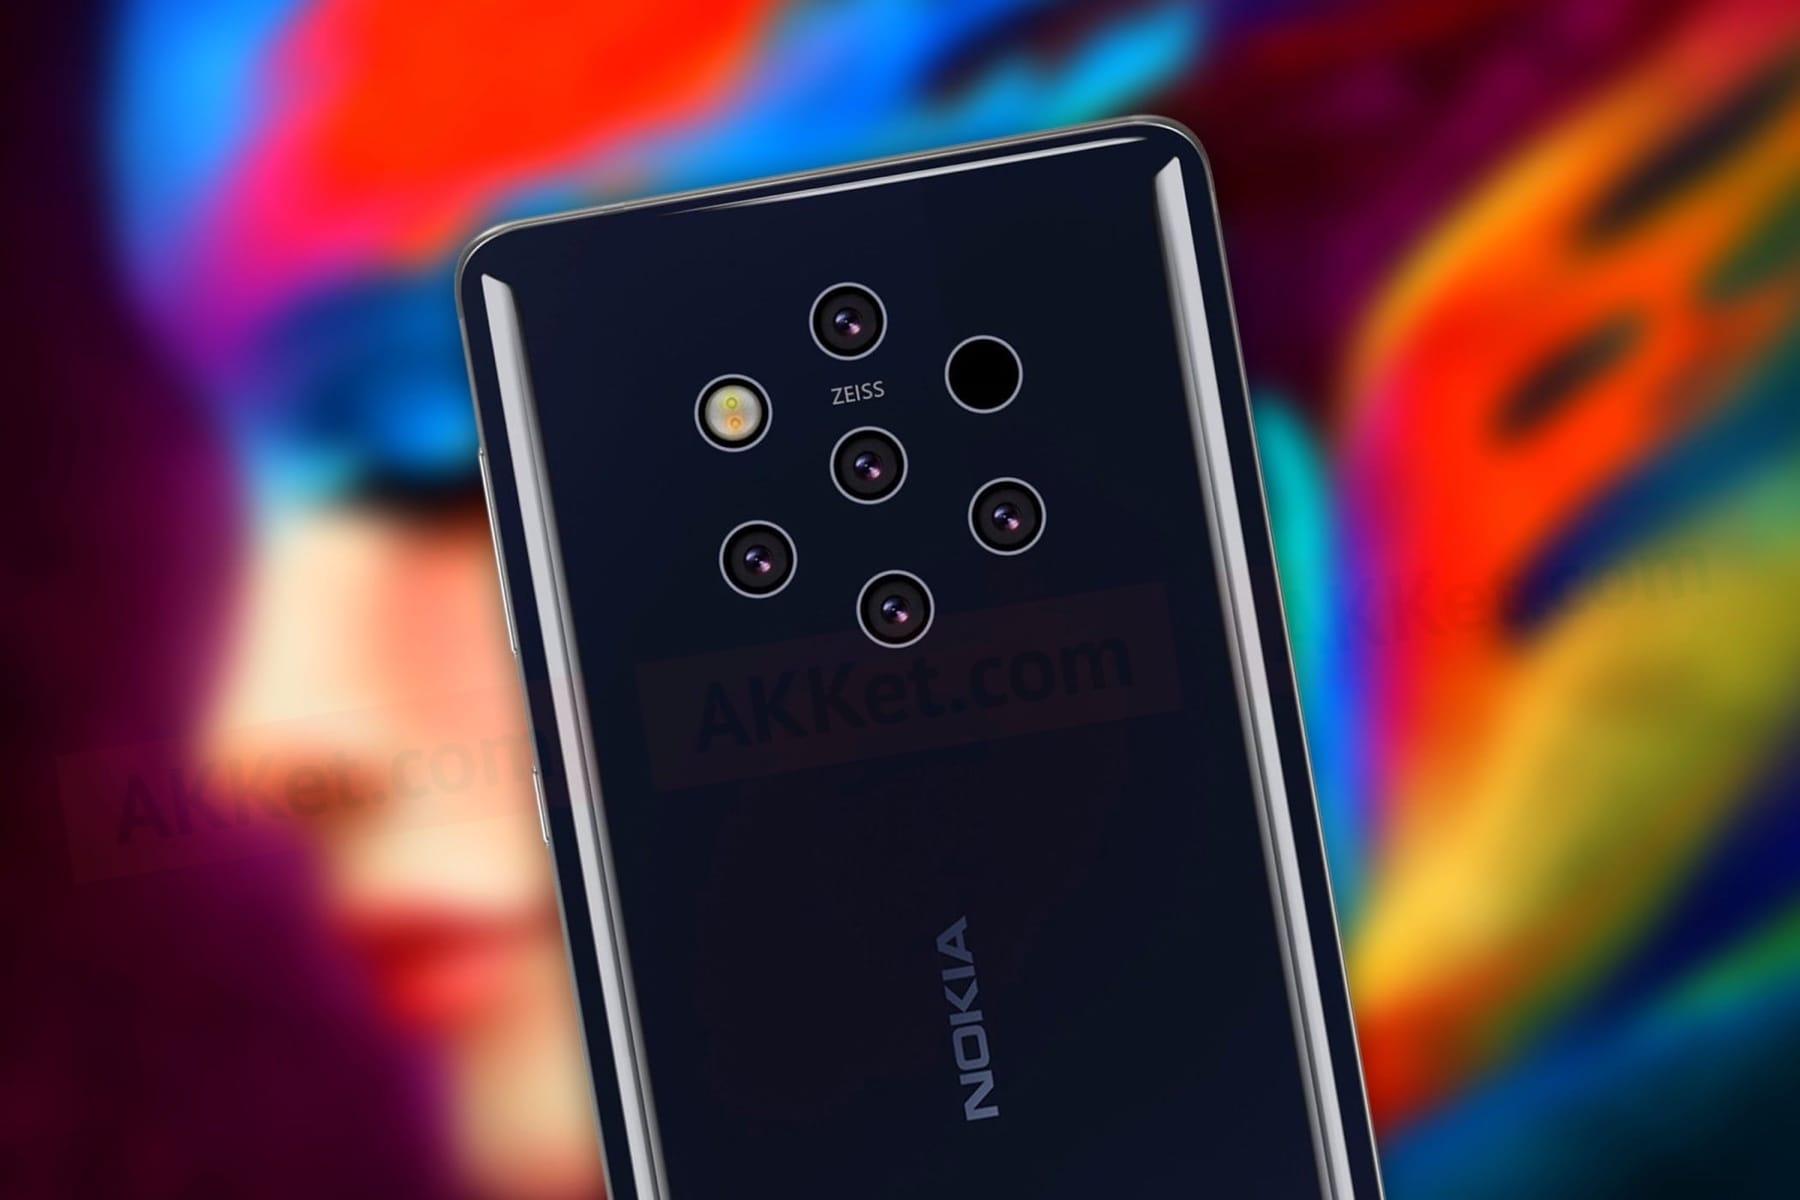 0 Nokia 9 PureView технические характеристики особенности цена и дата презентации